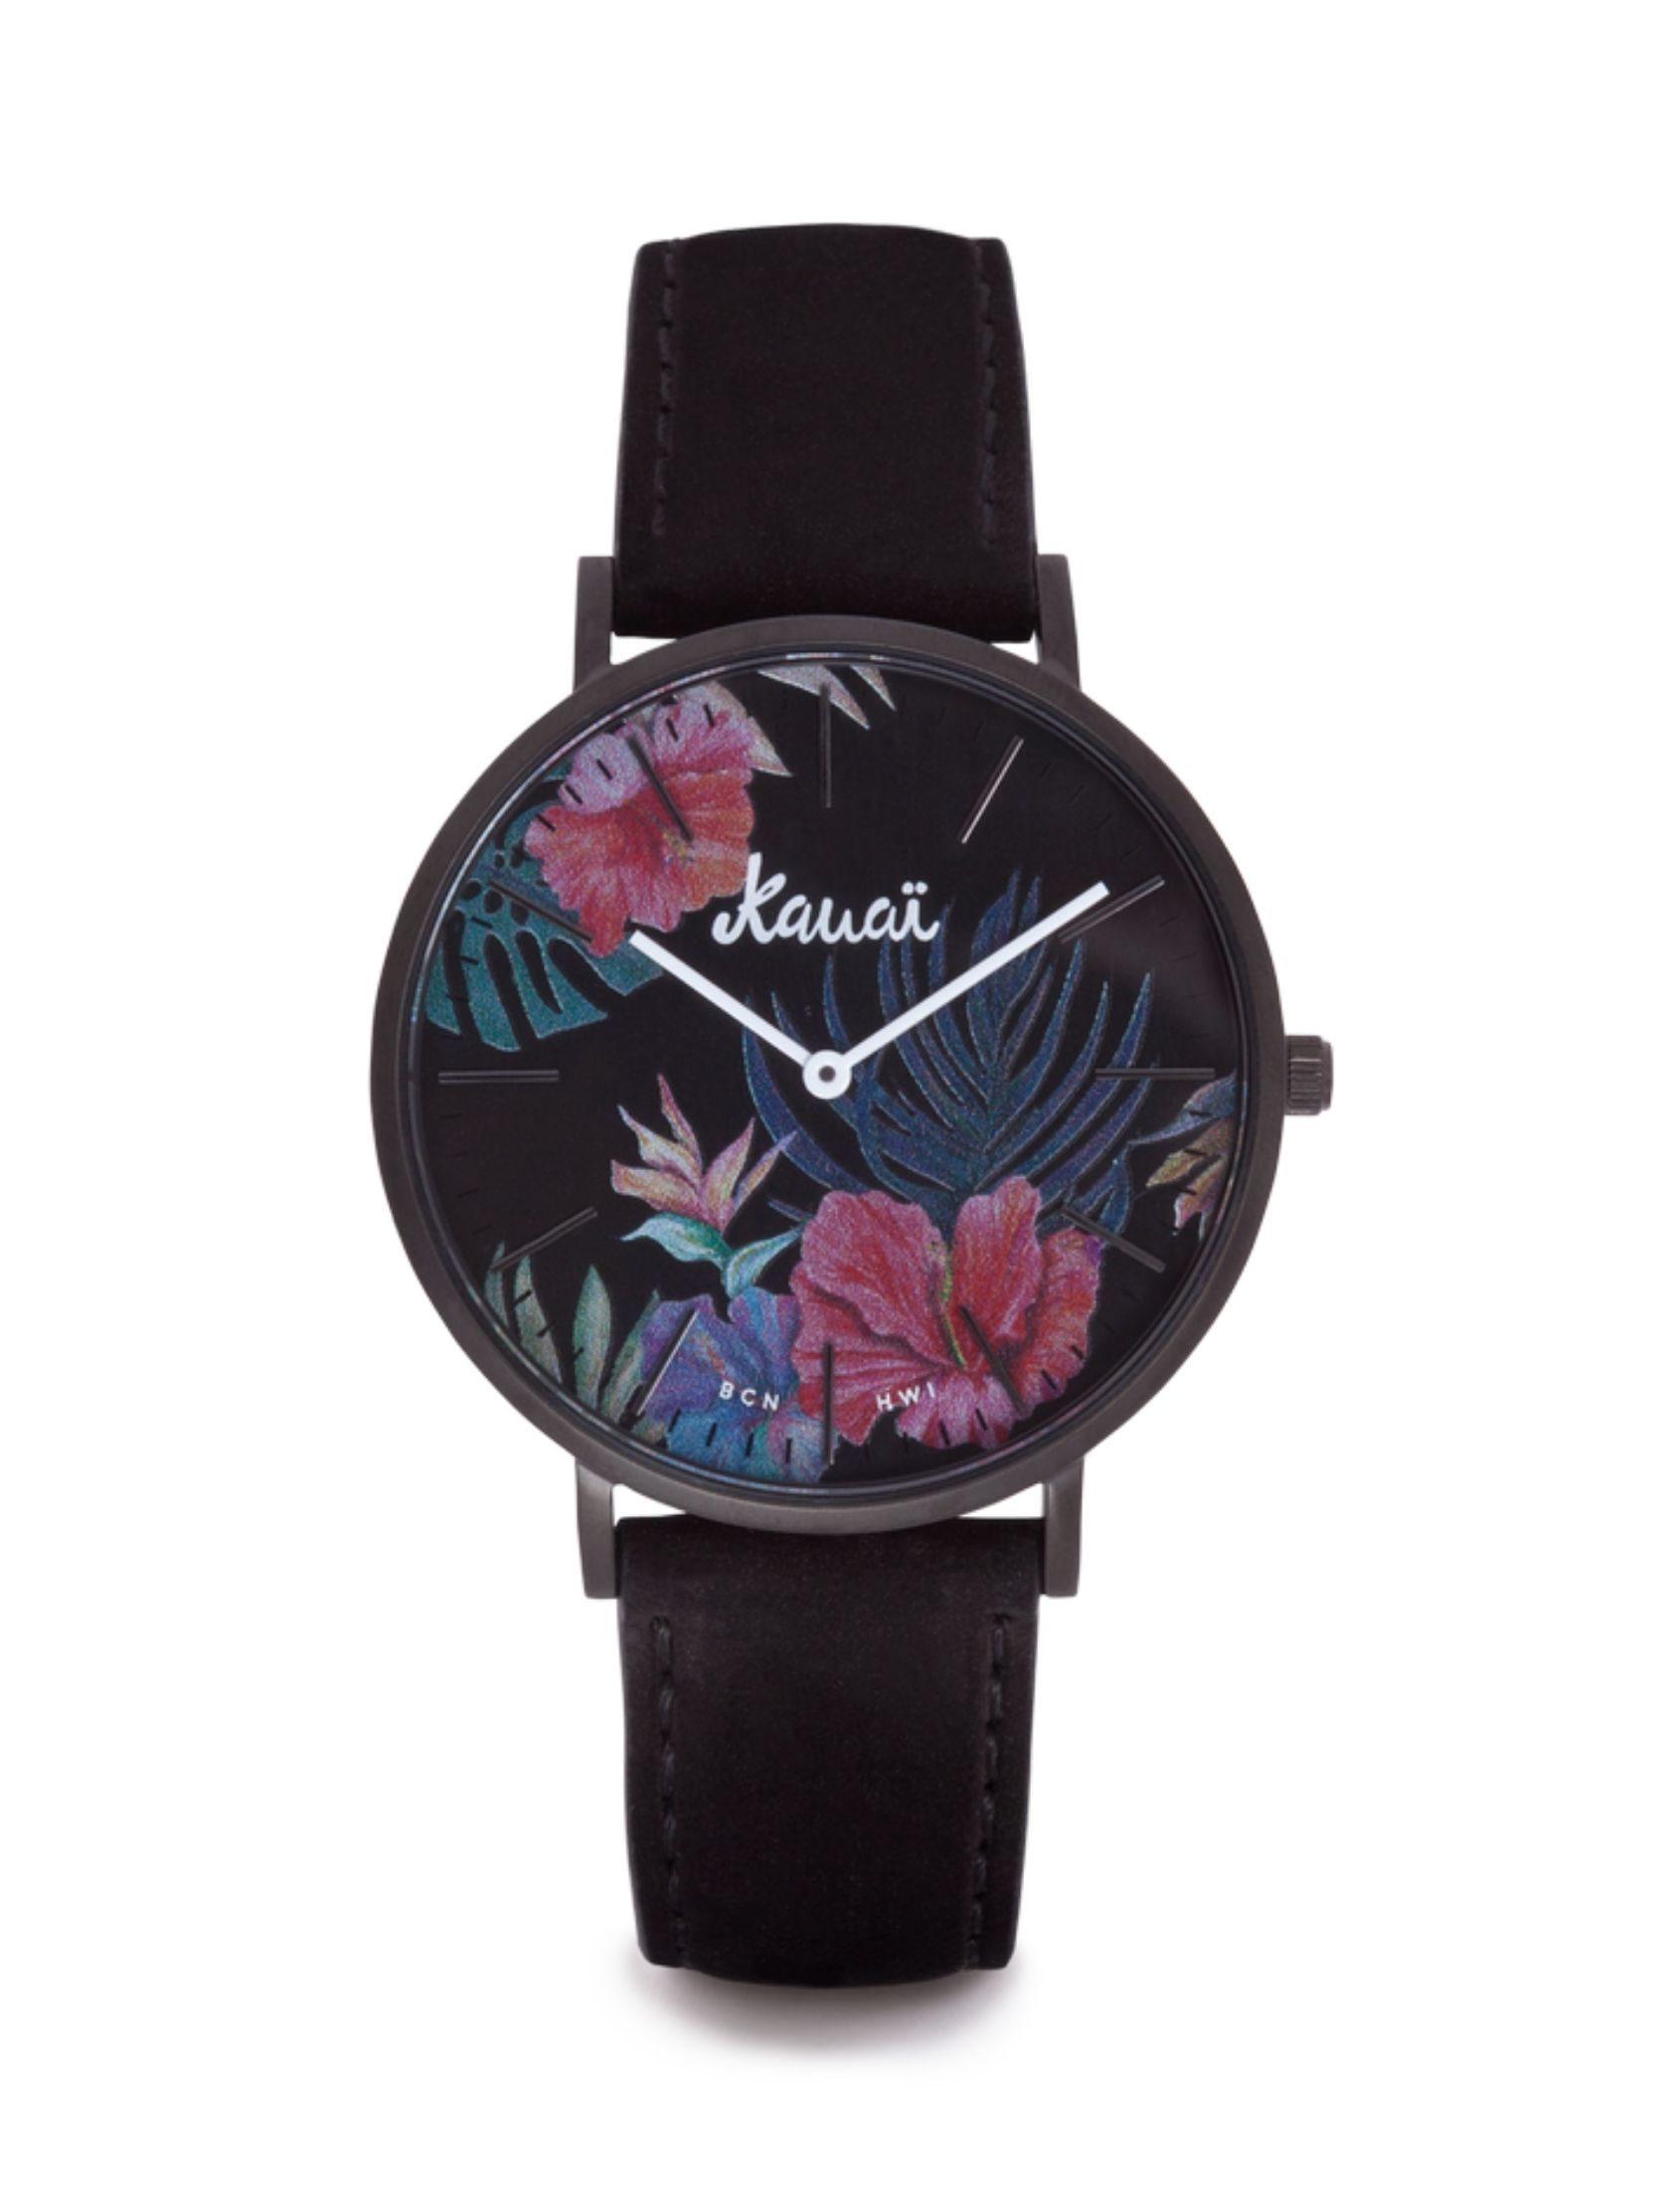 reloj kaua de kauai watches con esfera tropical y correa negro